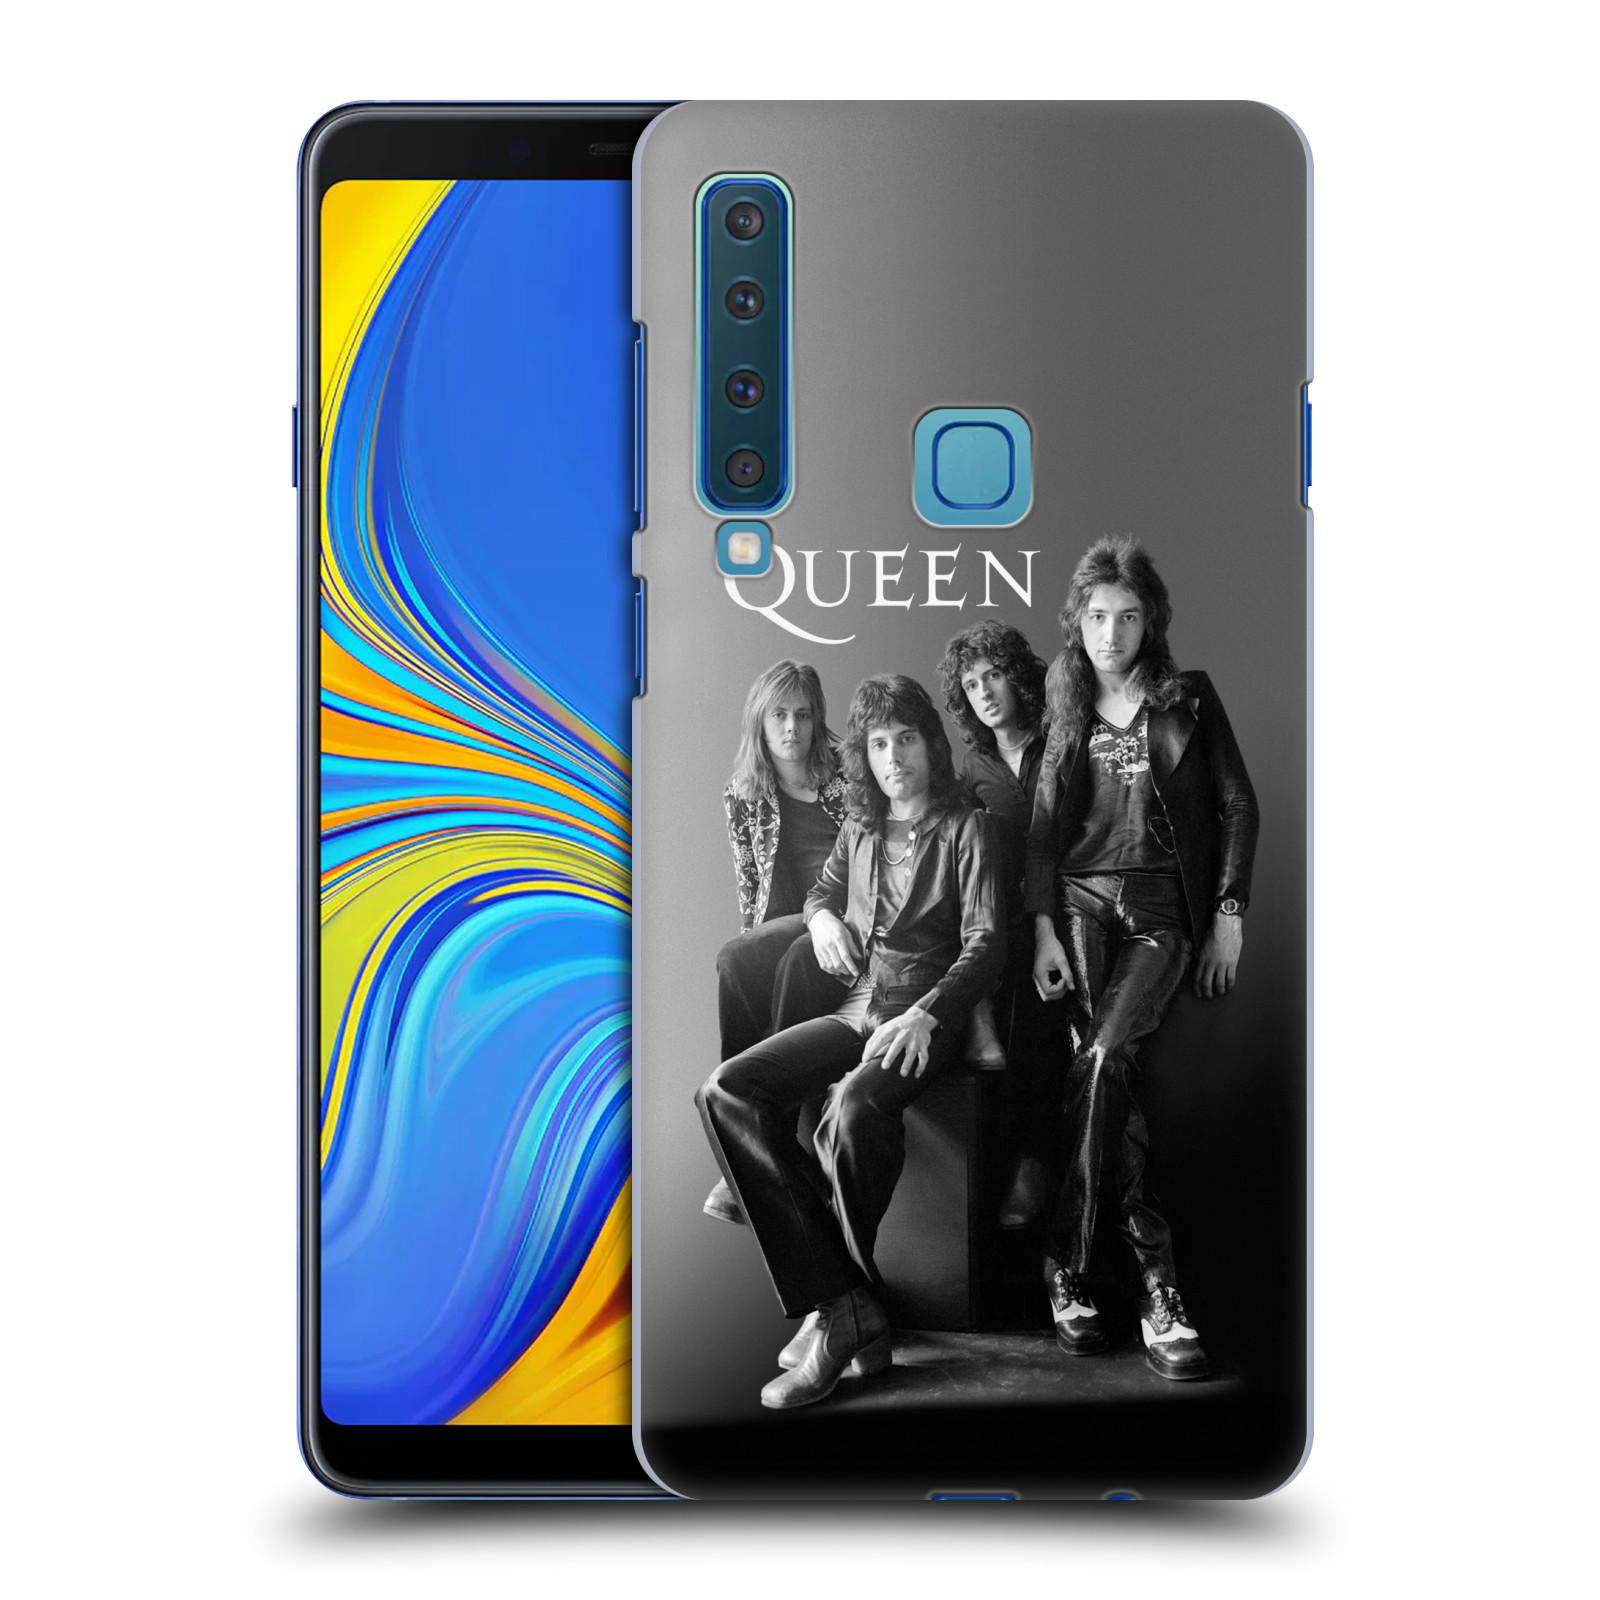 Plastové pouzdro na mobil Samsung Galaxy A9 (2018) - Head Case - Queen - Skupina